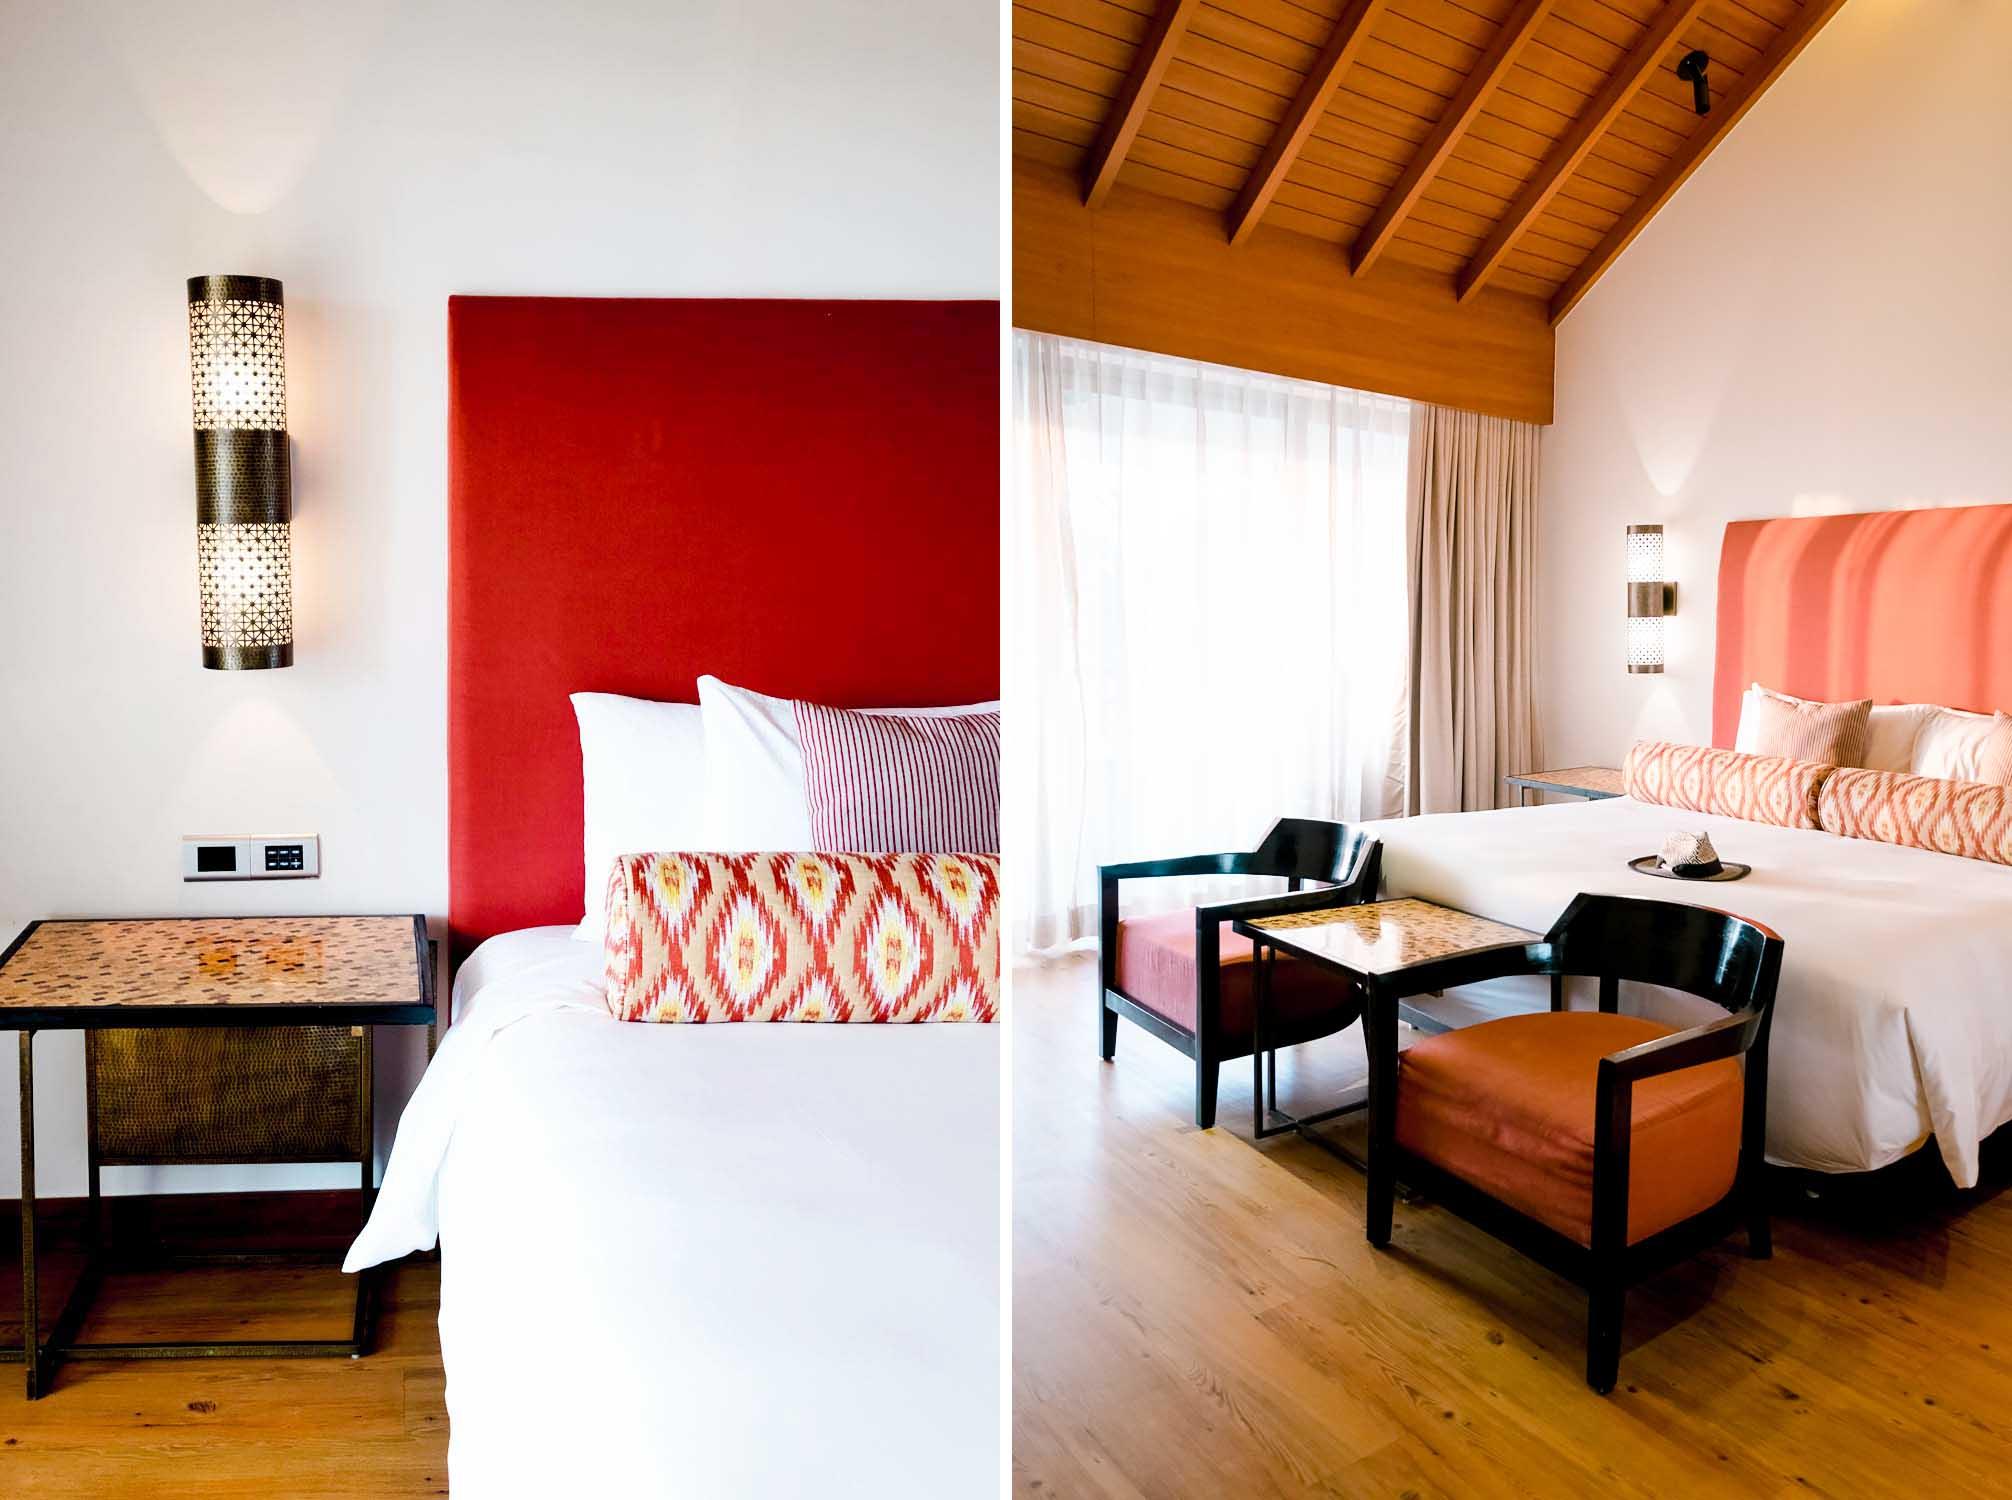 The Loft Room - Alila Diwa Goa Resort, India